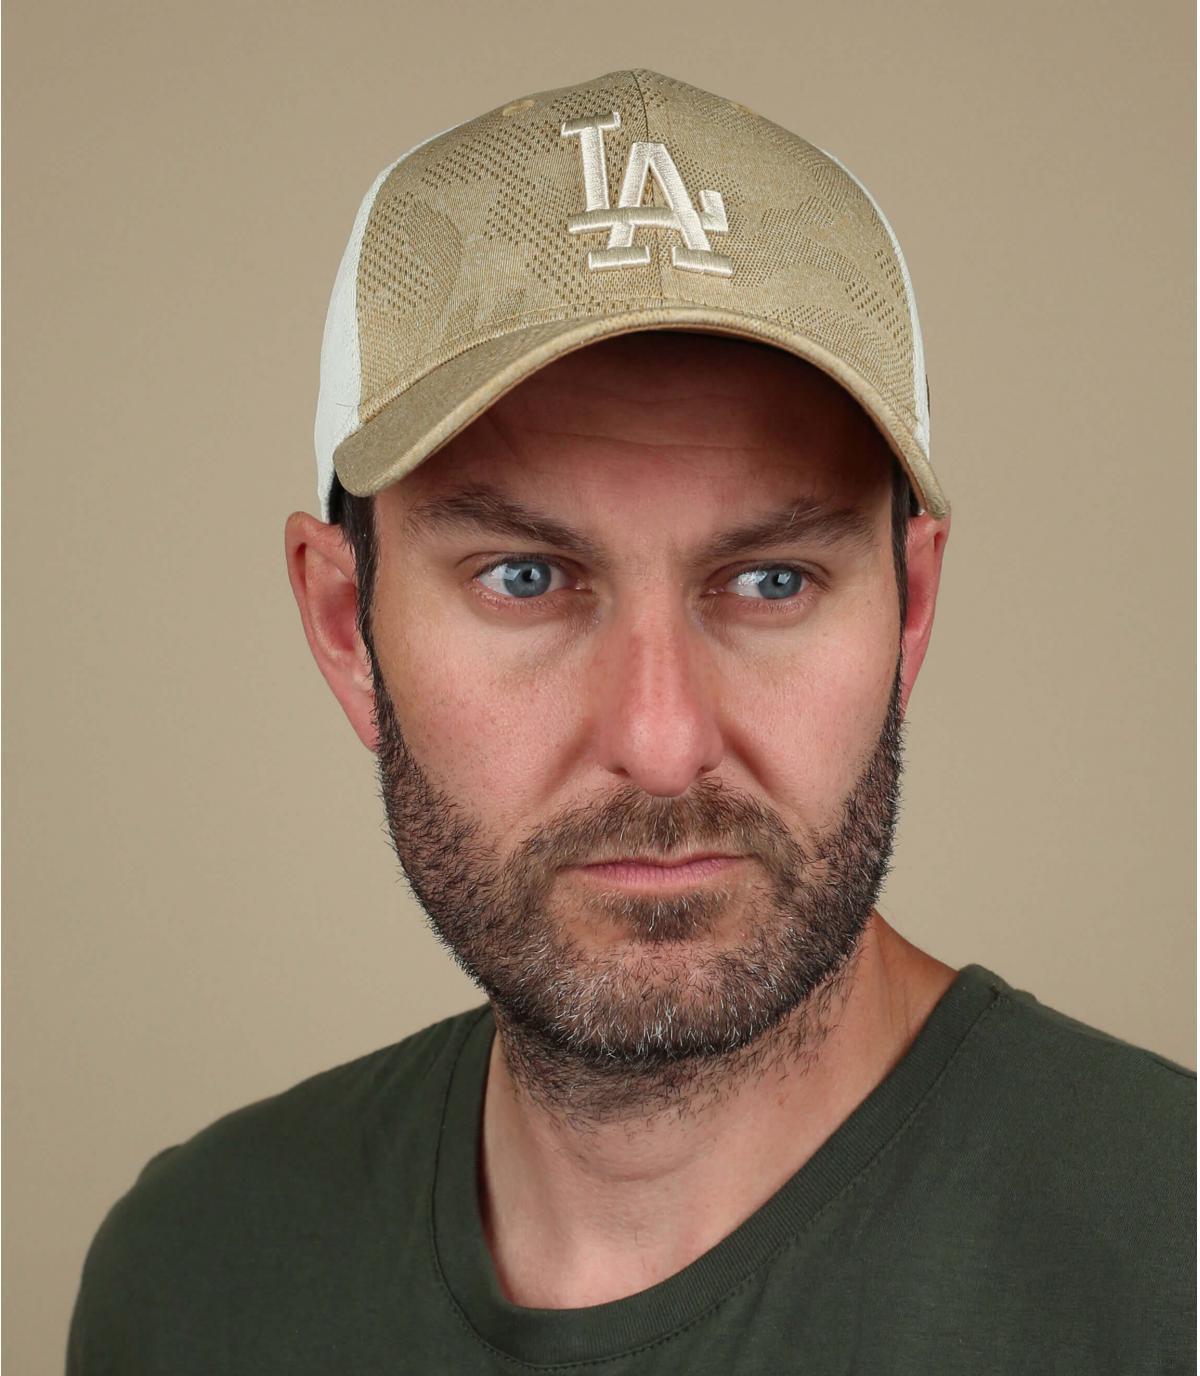 cappellino LA beige